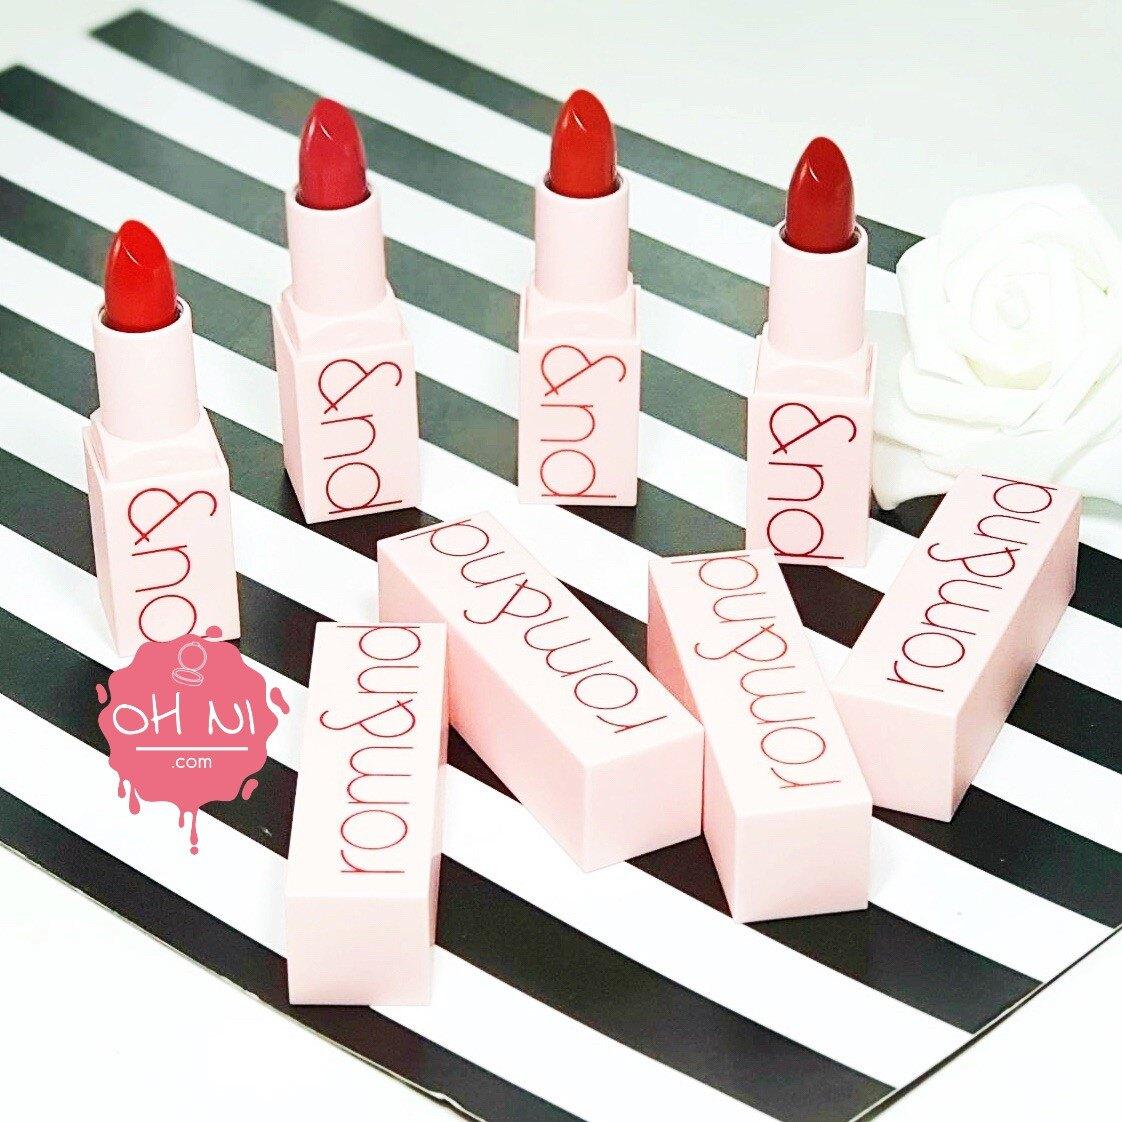 Rom&nd 四季玫瑰唇膏 Romand OH NI.姐姐。人氣店家oh ni 姐姐美妝的唇部彩妝、保養有最棒的商品。快到日本NO.1的Rakuten樂天市場的安全環境中盡情網路購物,使用樂天信用卡選